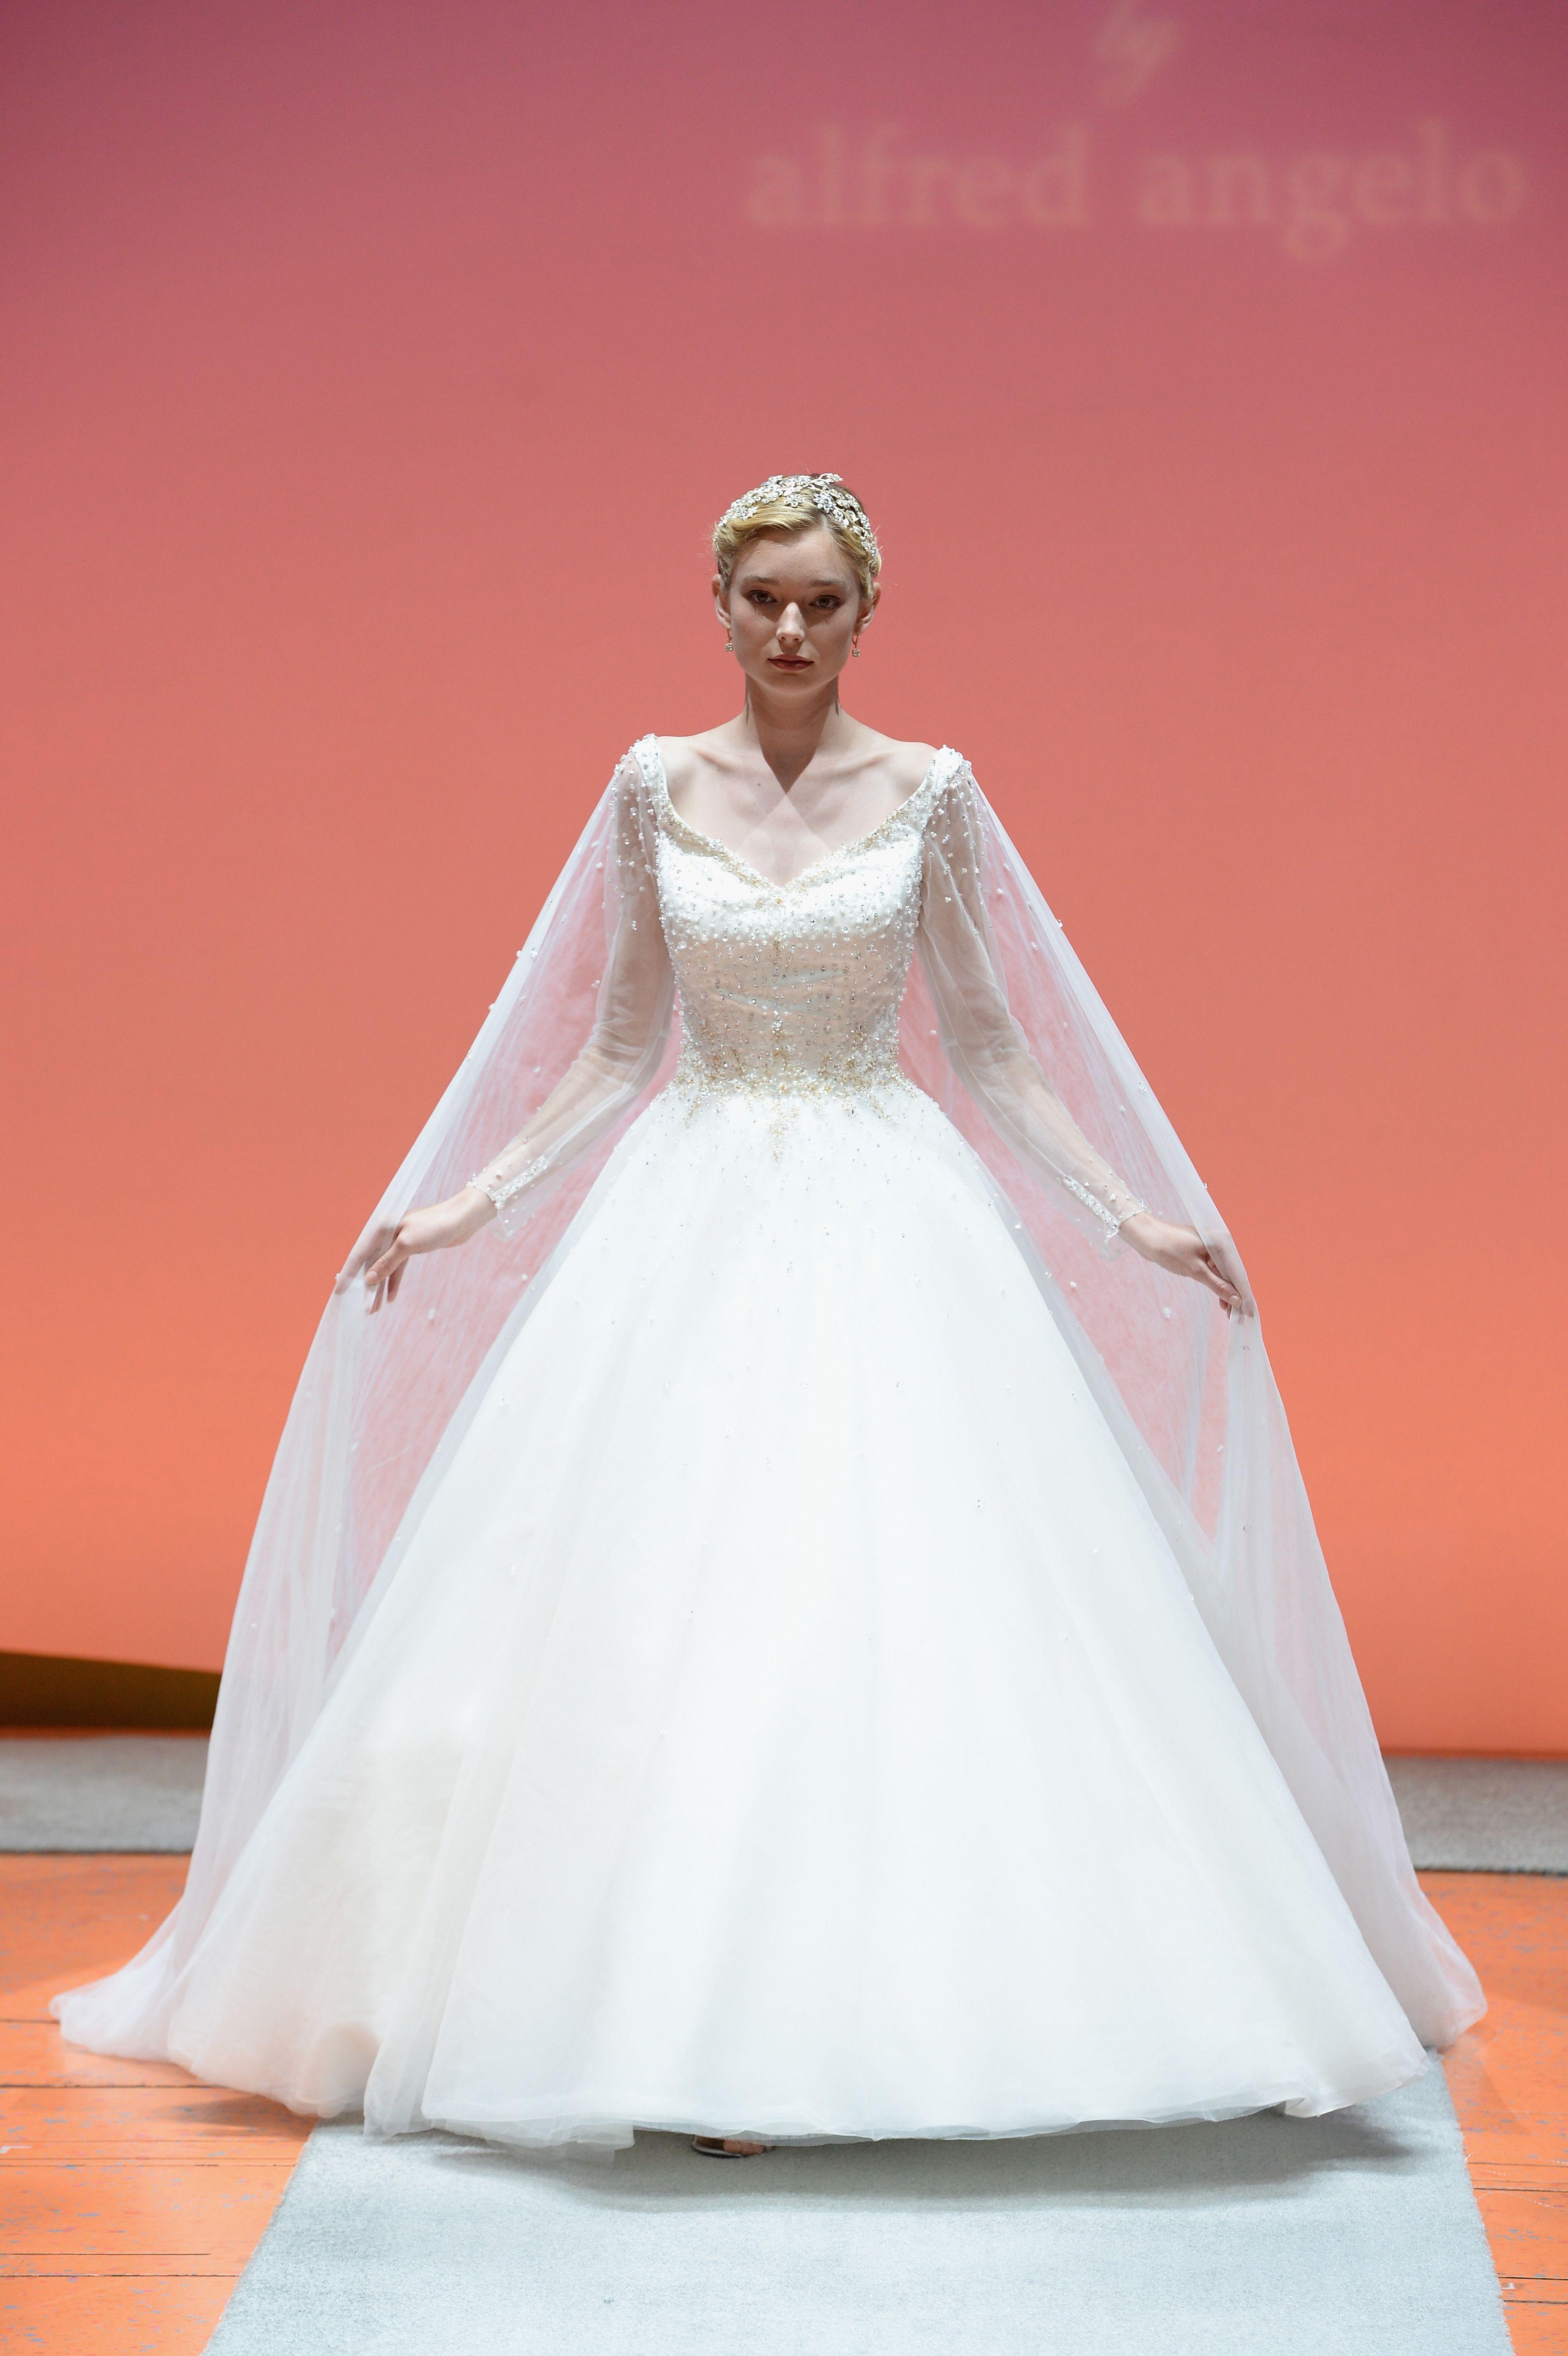 2016 Disney Fairy Tale Weddings By Alfred Angelo Elsa Disney Wedding Dresses Elsa Wedding Dress Disney Princess Wedding [ 4928 x 3280 Pixel ]